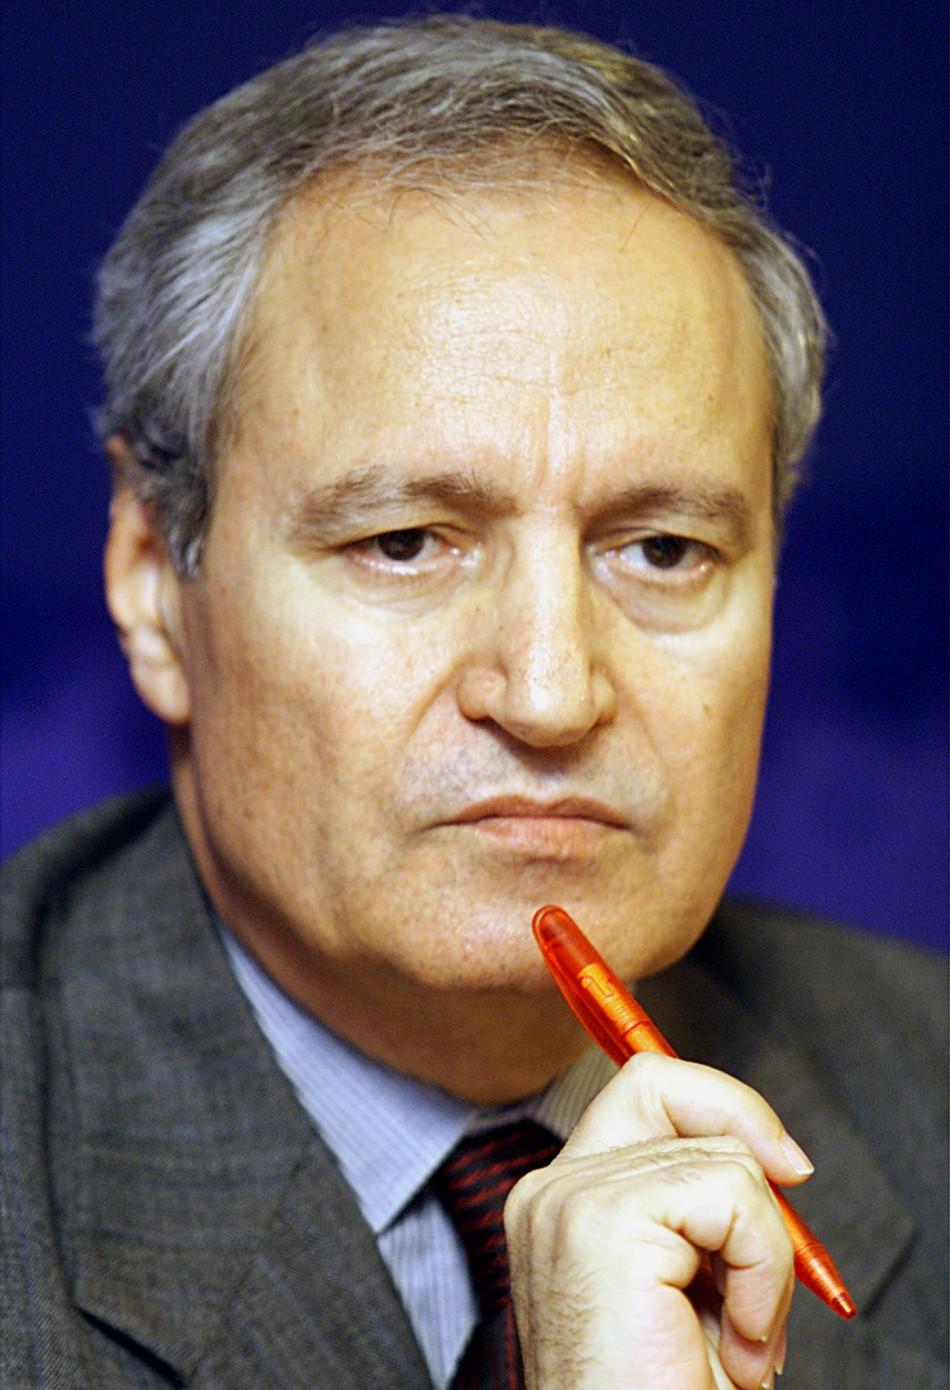 Farouk al-Sharaa, 60, Vice President